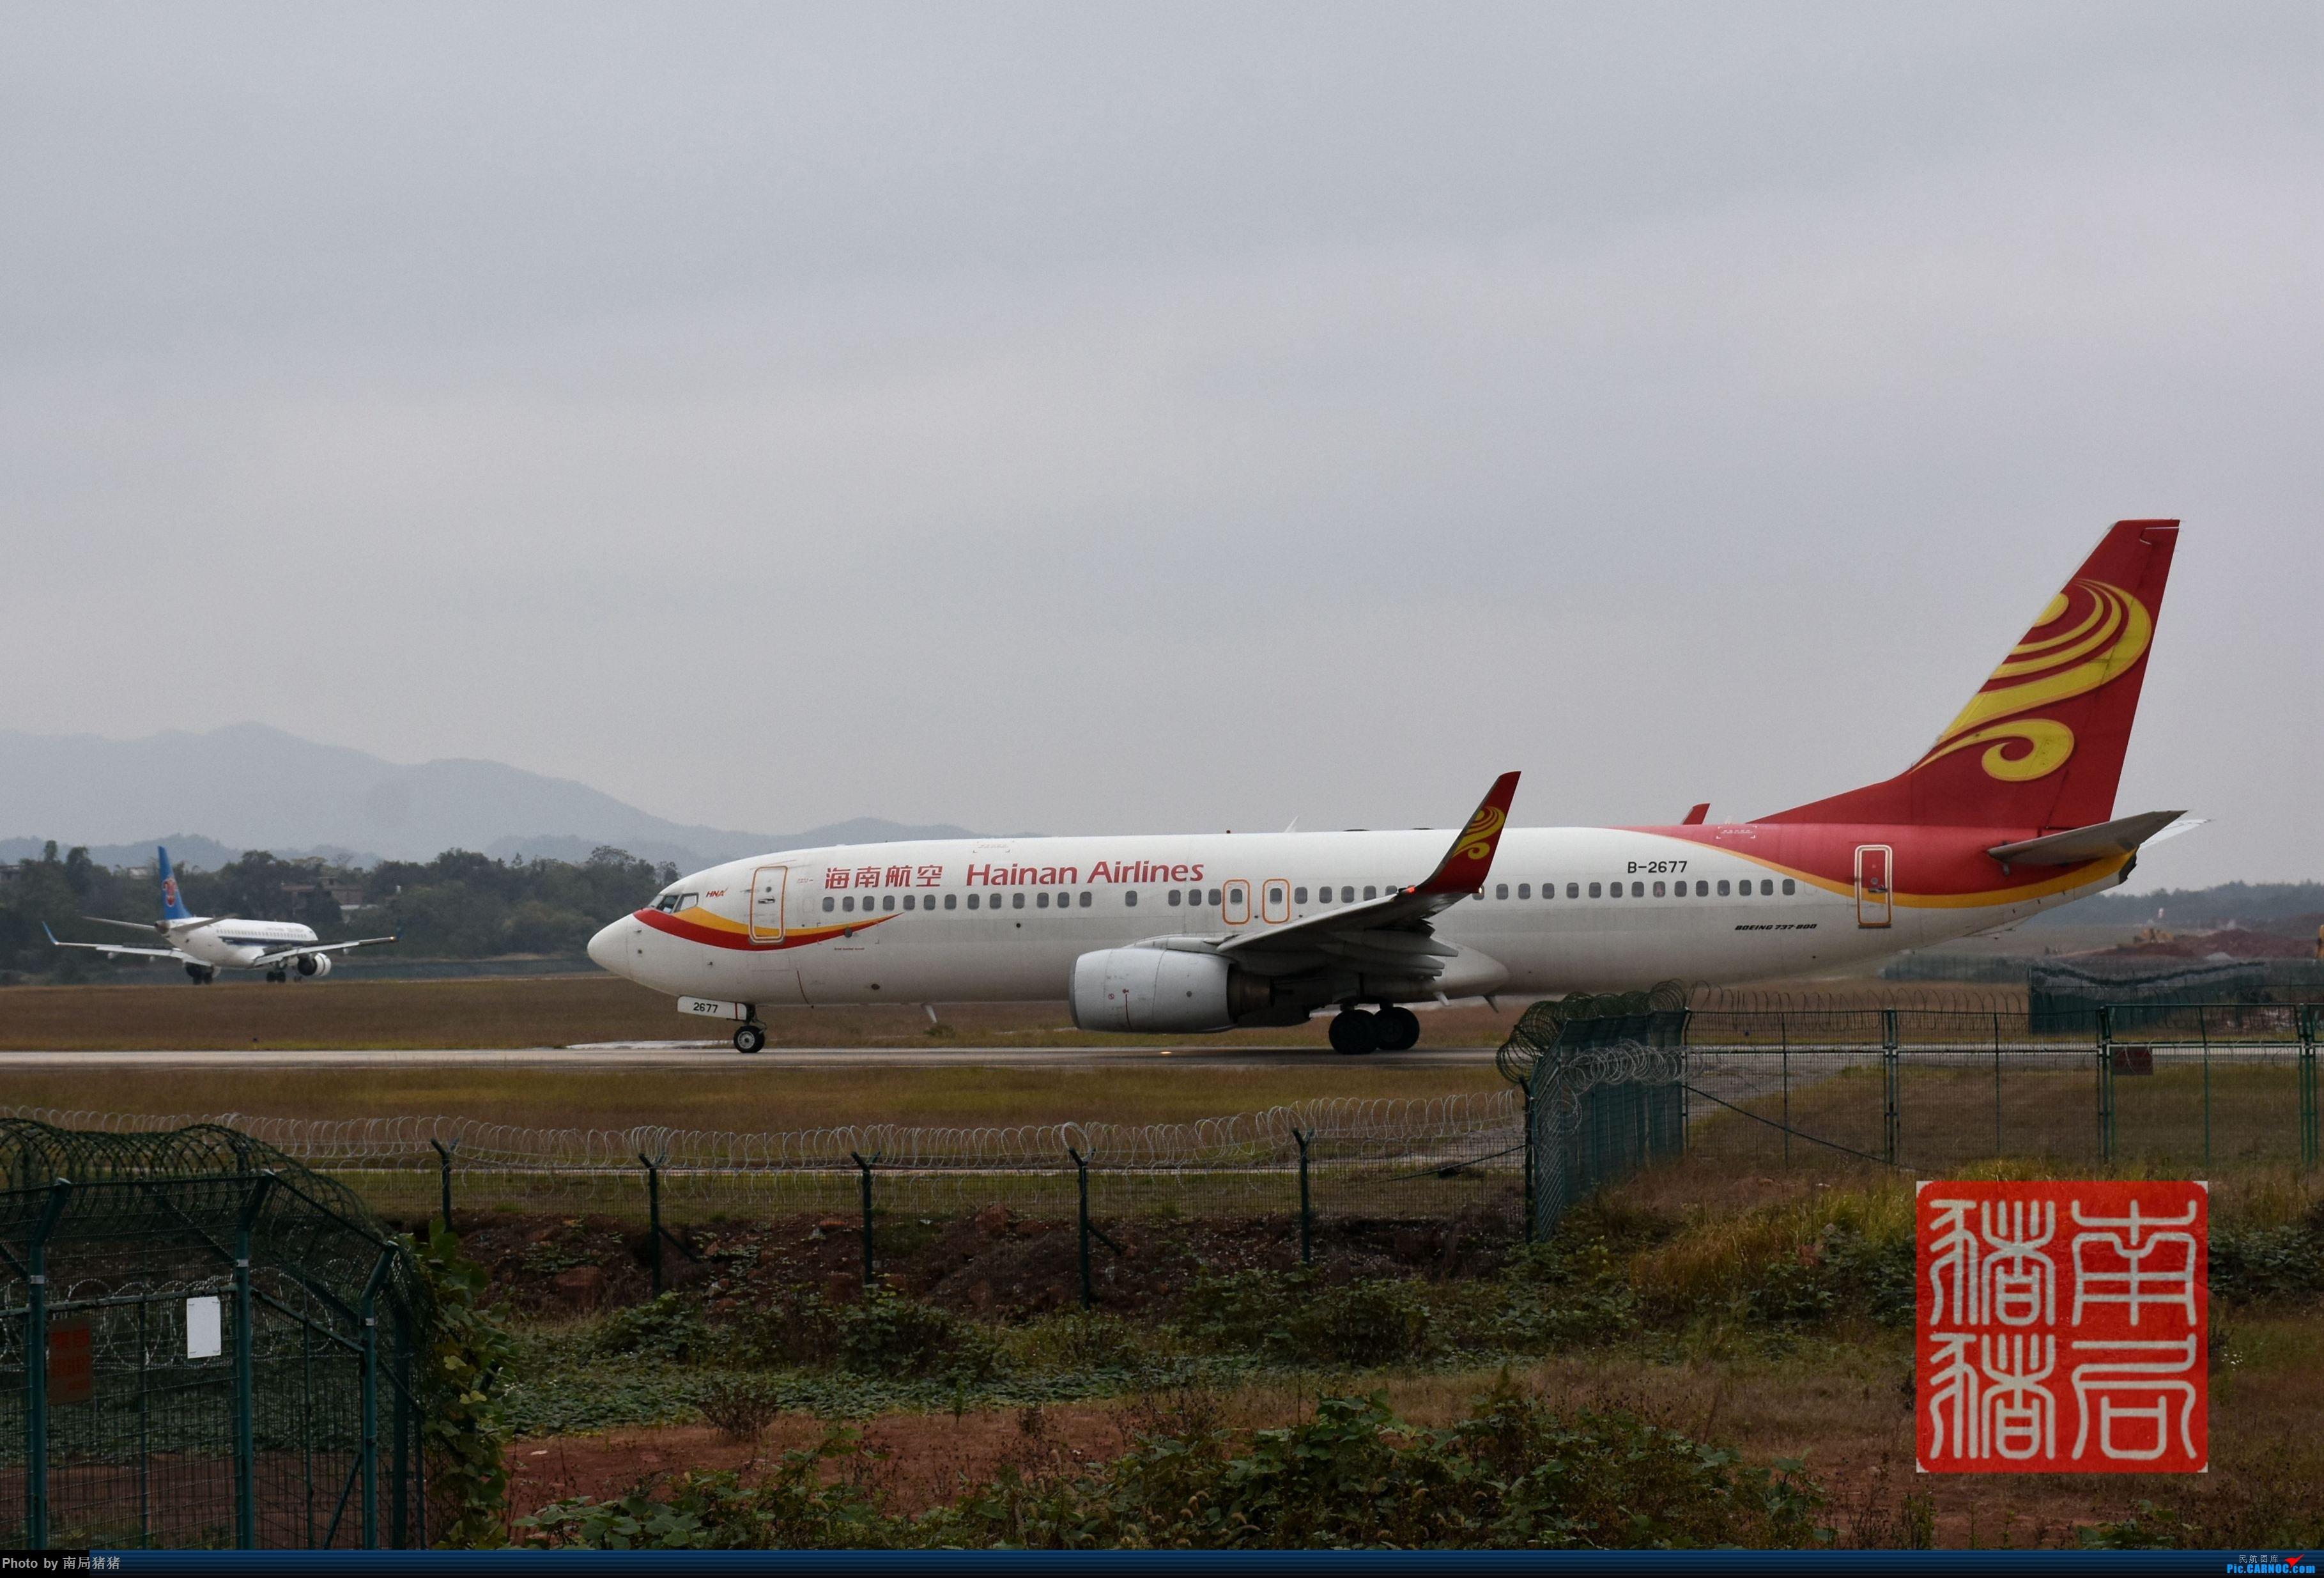 Re:[原创]KOW赣州黄金机场(通航运12,北部湾变形金刚) BOEING 737-800 B-2677 中国赣州黄金机场